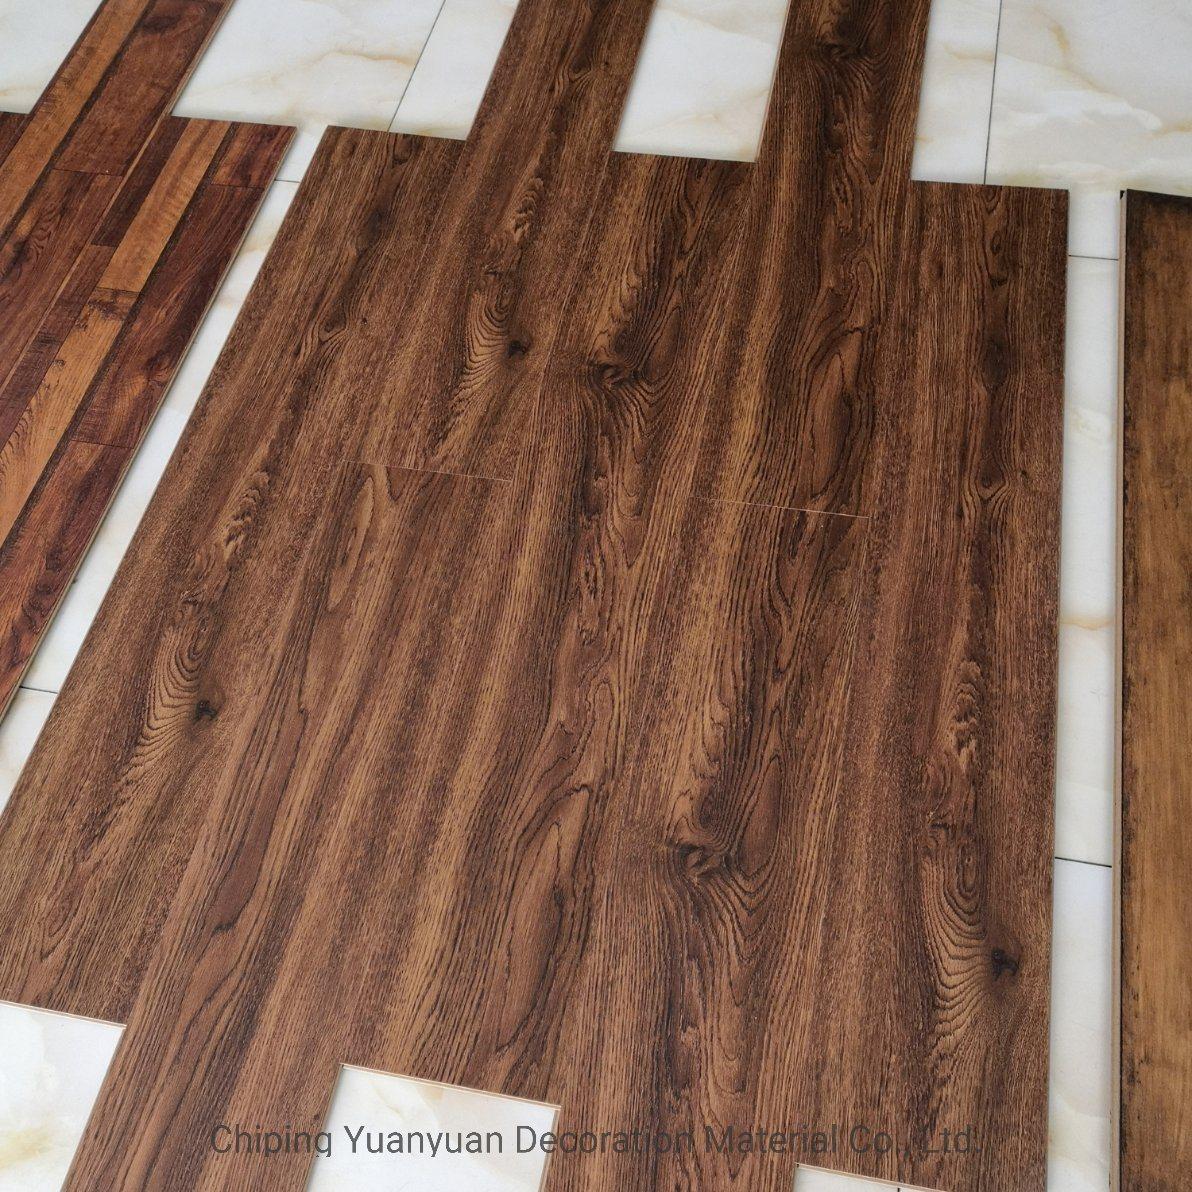 China 8 3mm 12 Wood Flooring Hdf, Unilin Laminate Flooring